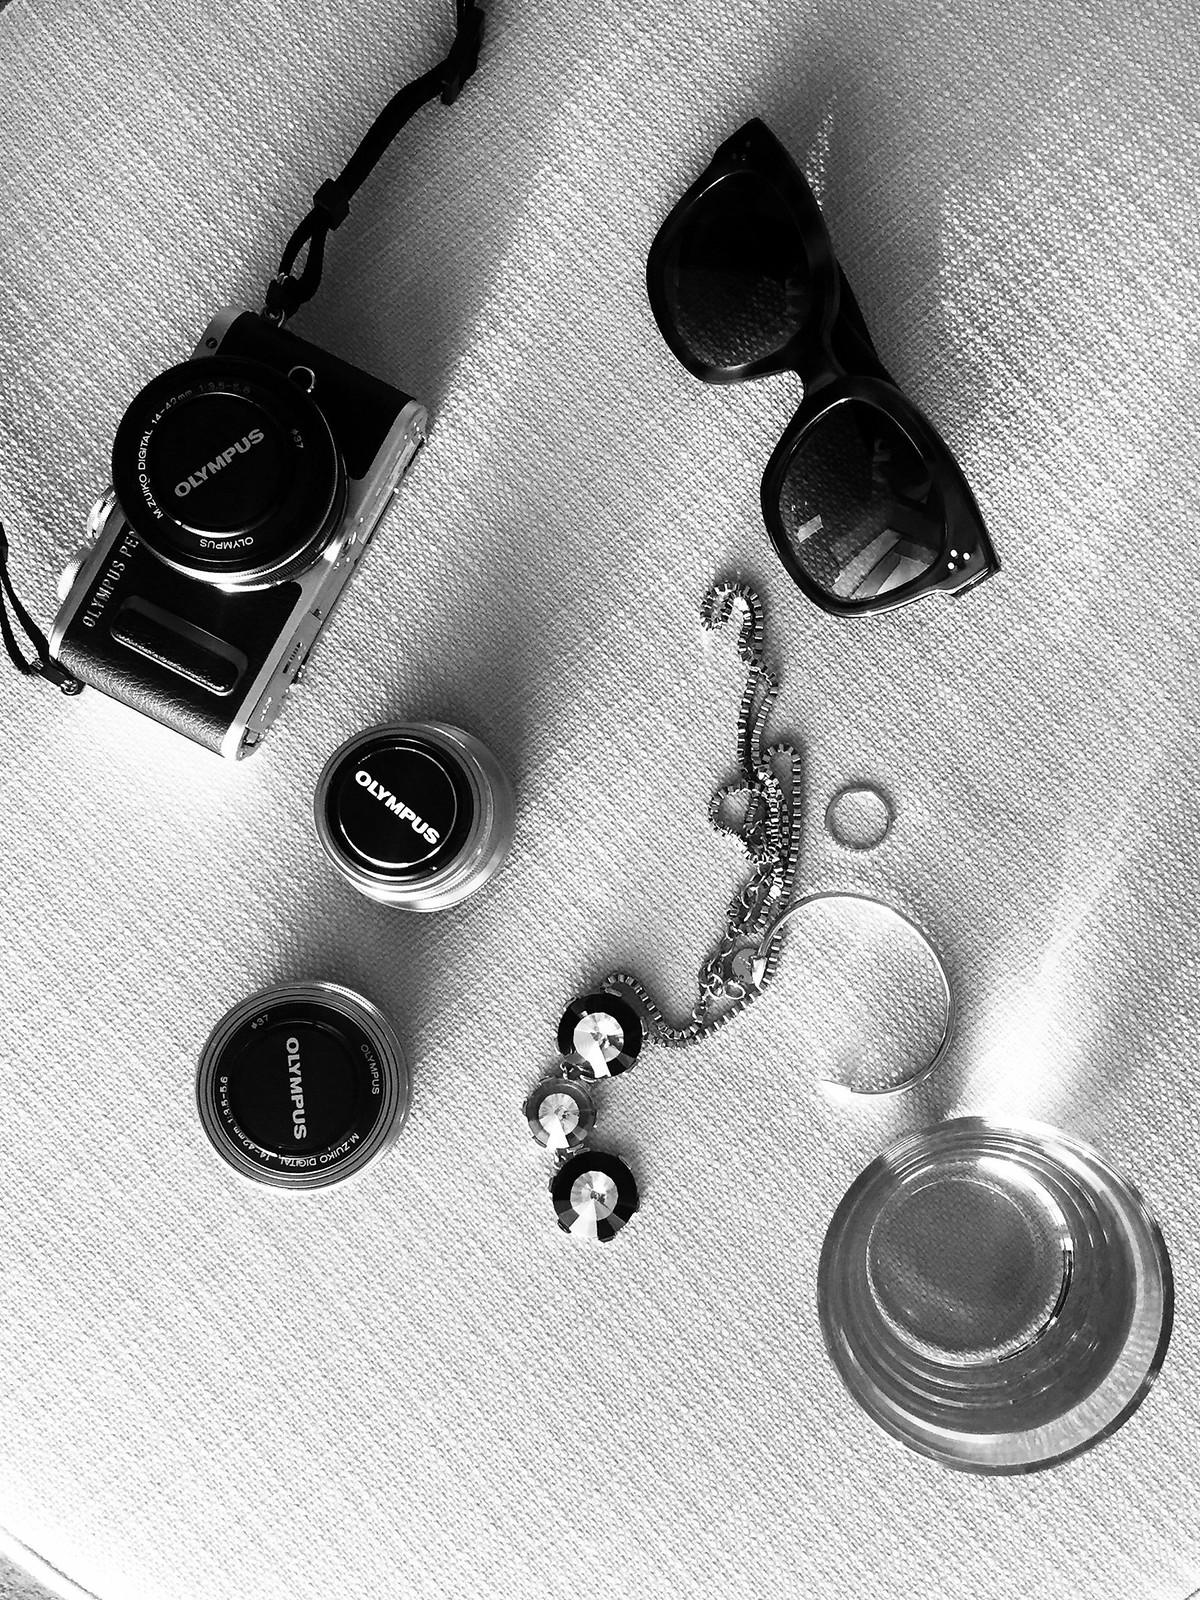 olympus #penpartygreece #olympuspengeneration pen e-pl8 greece nikki beach resort spa palm sun summer travel travelblogger germanblogger pool sun bathing bikini camera photography photographer cats & dogs lifestyleblog ricarda schernus fashionblogger 2